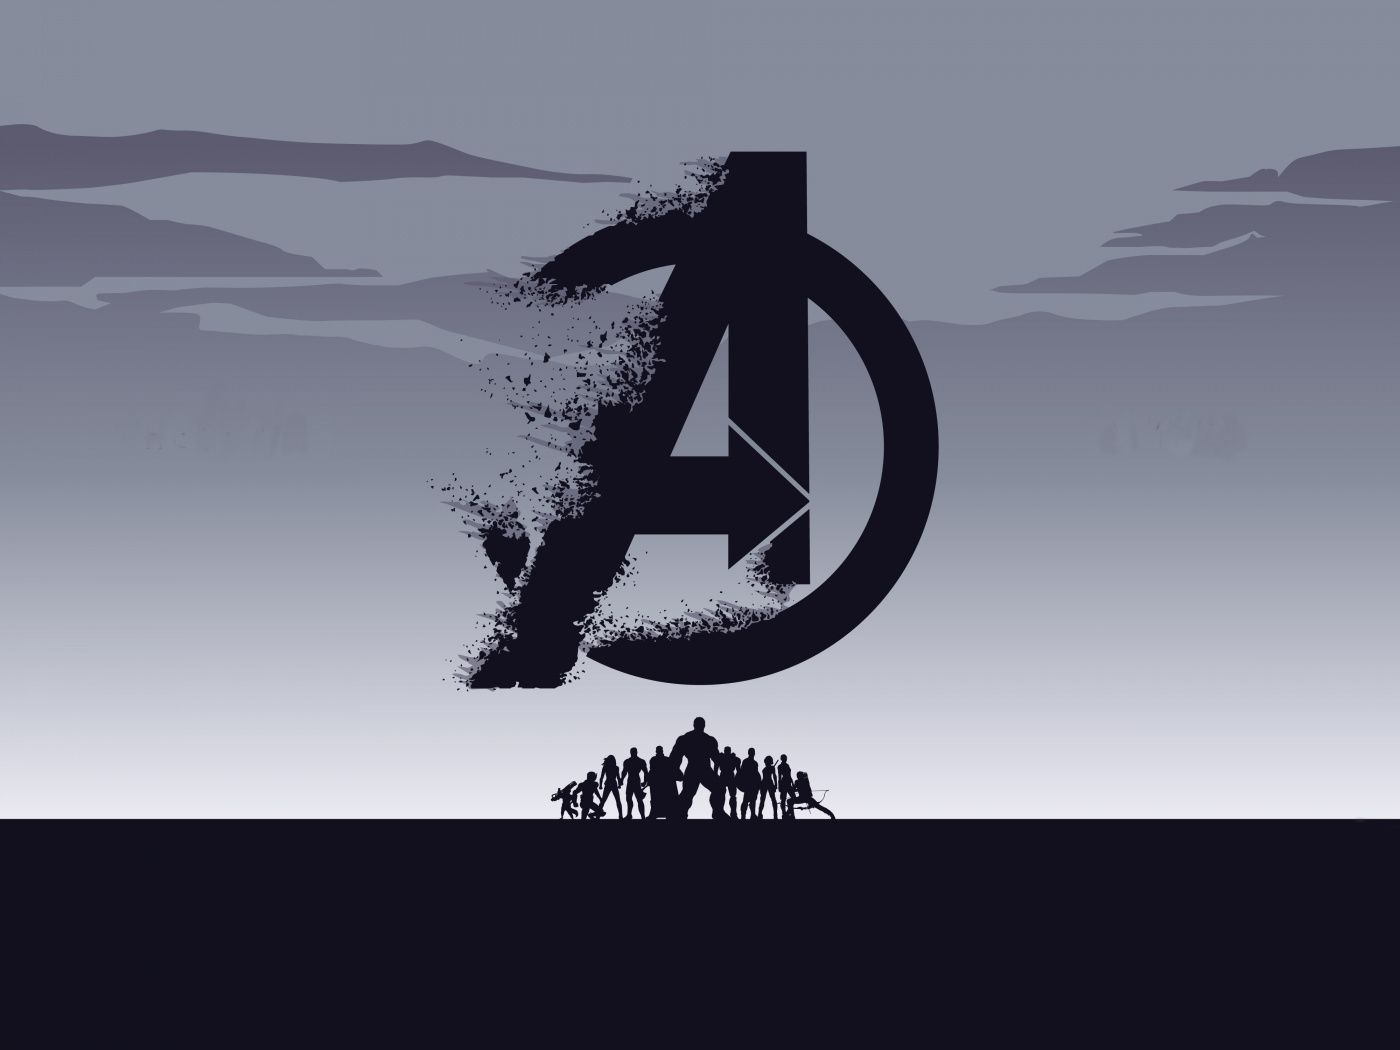 Download 1400x1050 Wallpaper 2019 Movie Avengers Endgame Minimal Silhouette Art Standard 4 3 F Papel De Parede Pc Papeis De Parede Pc Wallpapers Para Pc